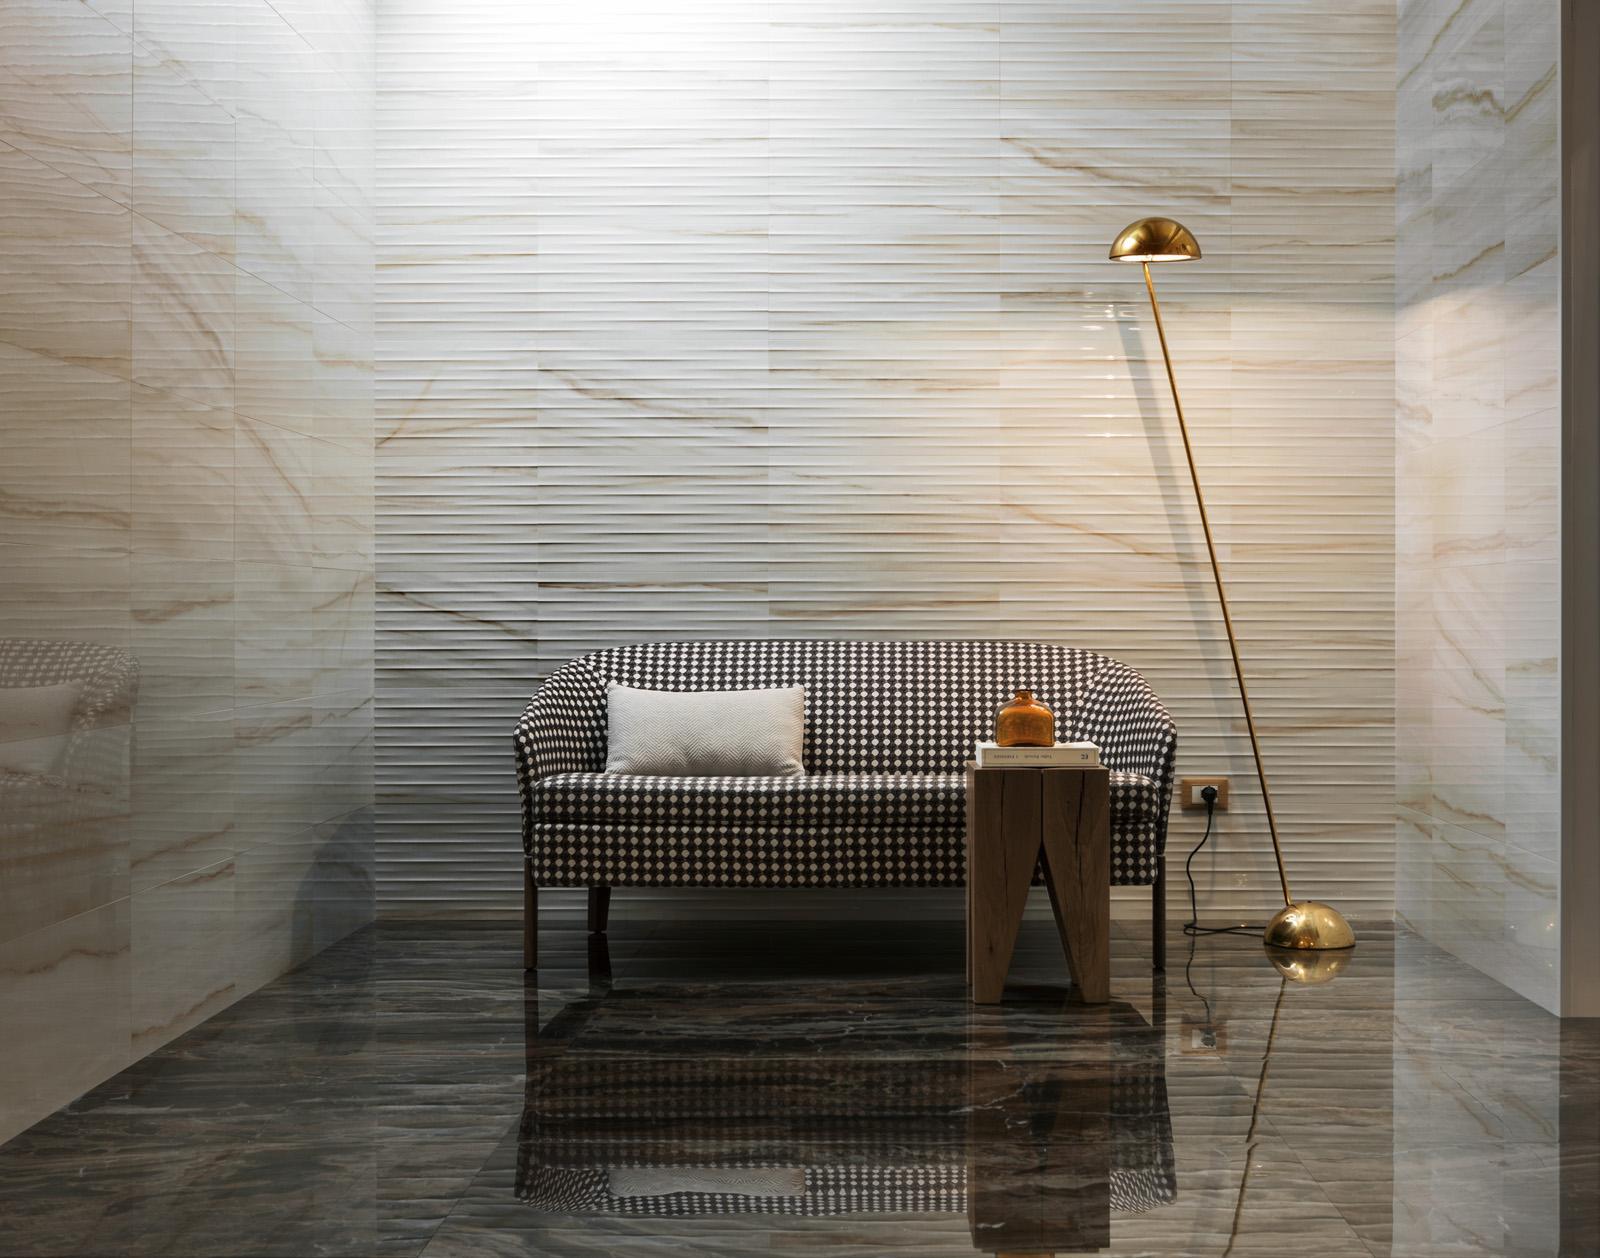 Carrelages effet marbre beige l Carrelages Delannoy